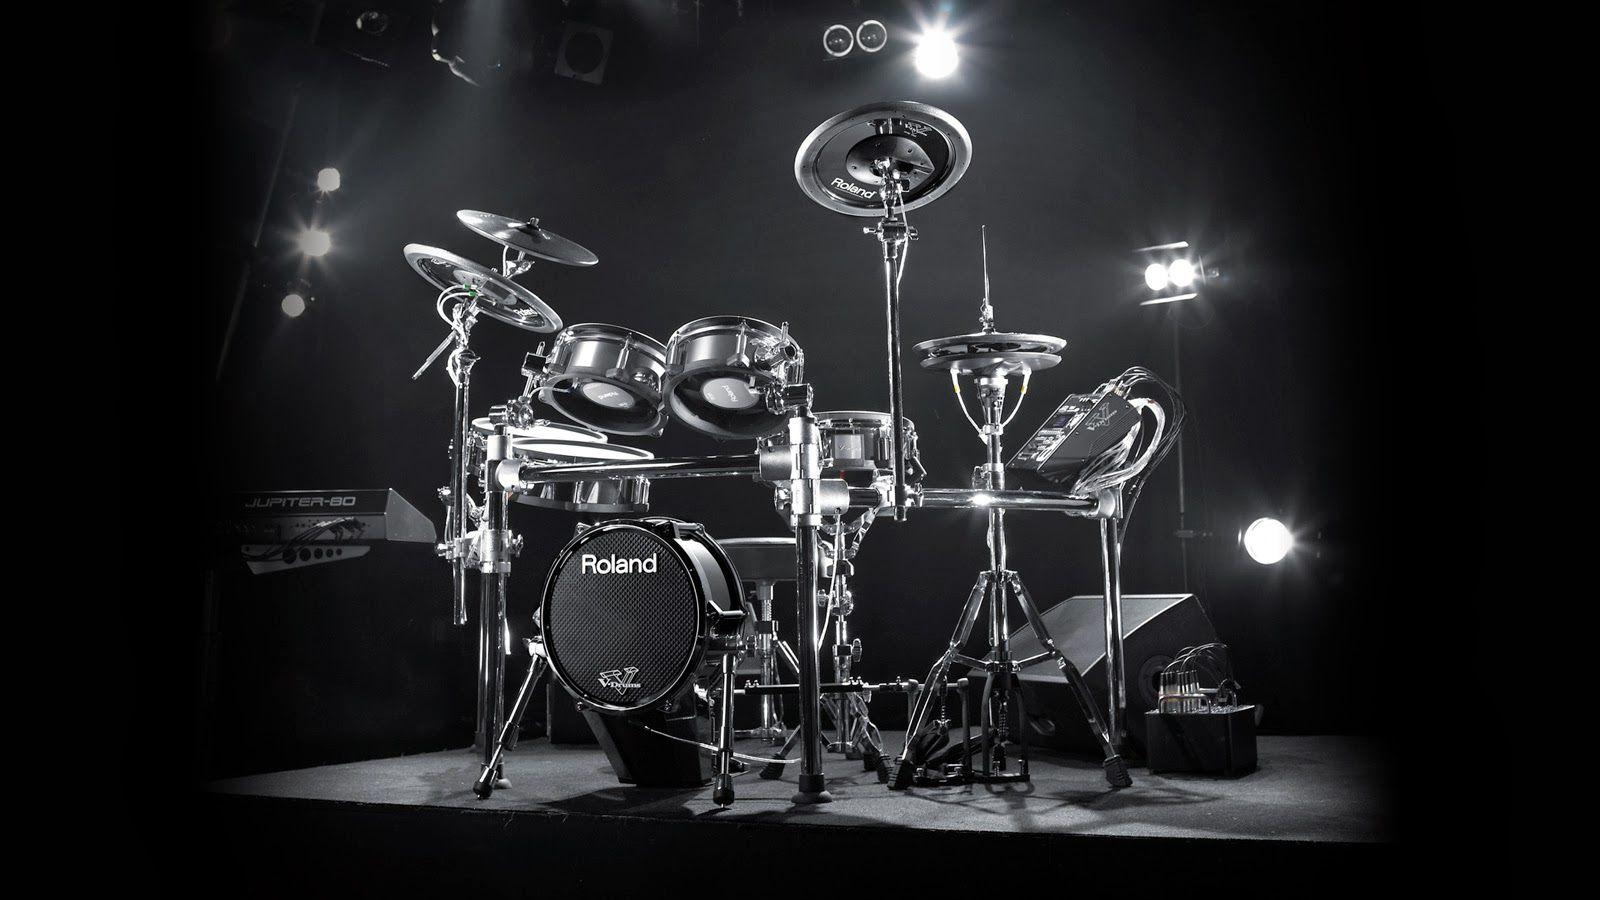 Music Drums Wallpaper Drummers And Drum Kits Drums